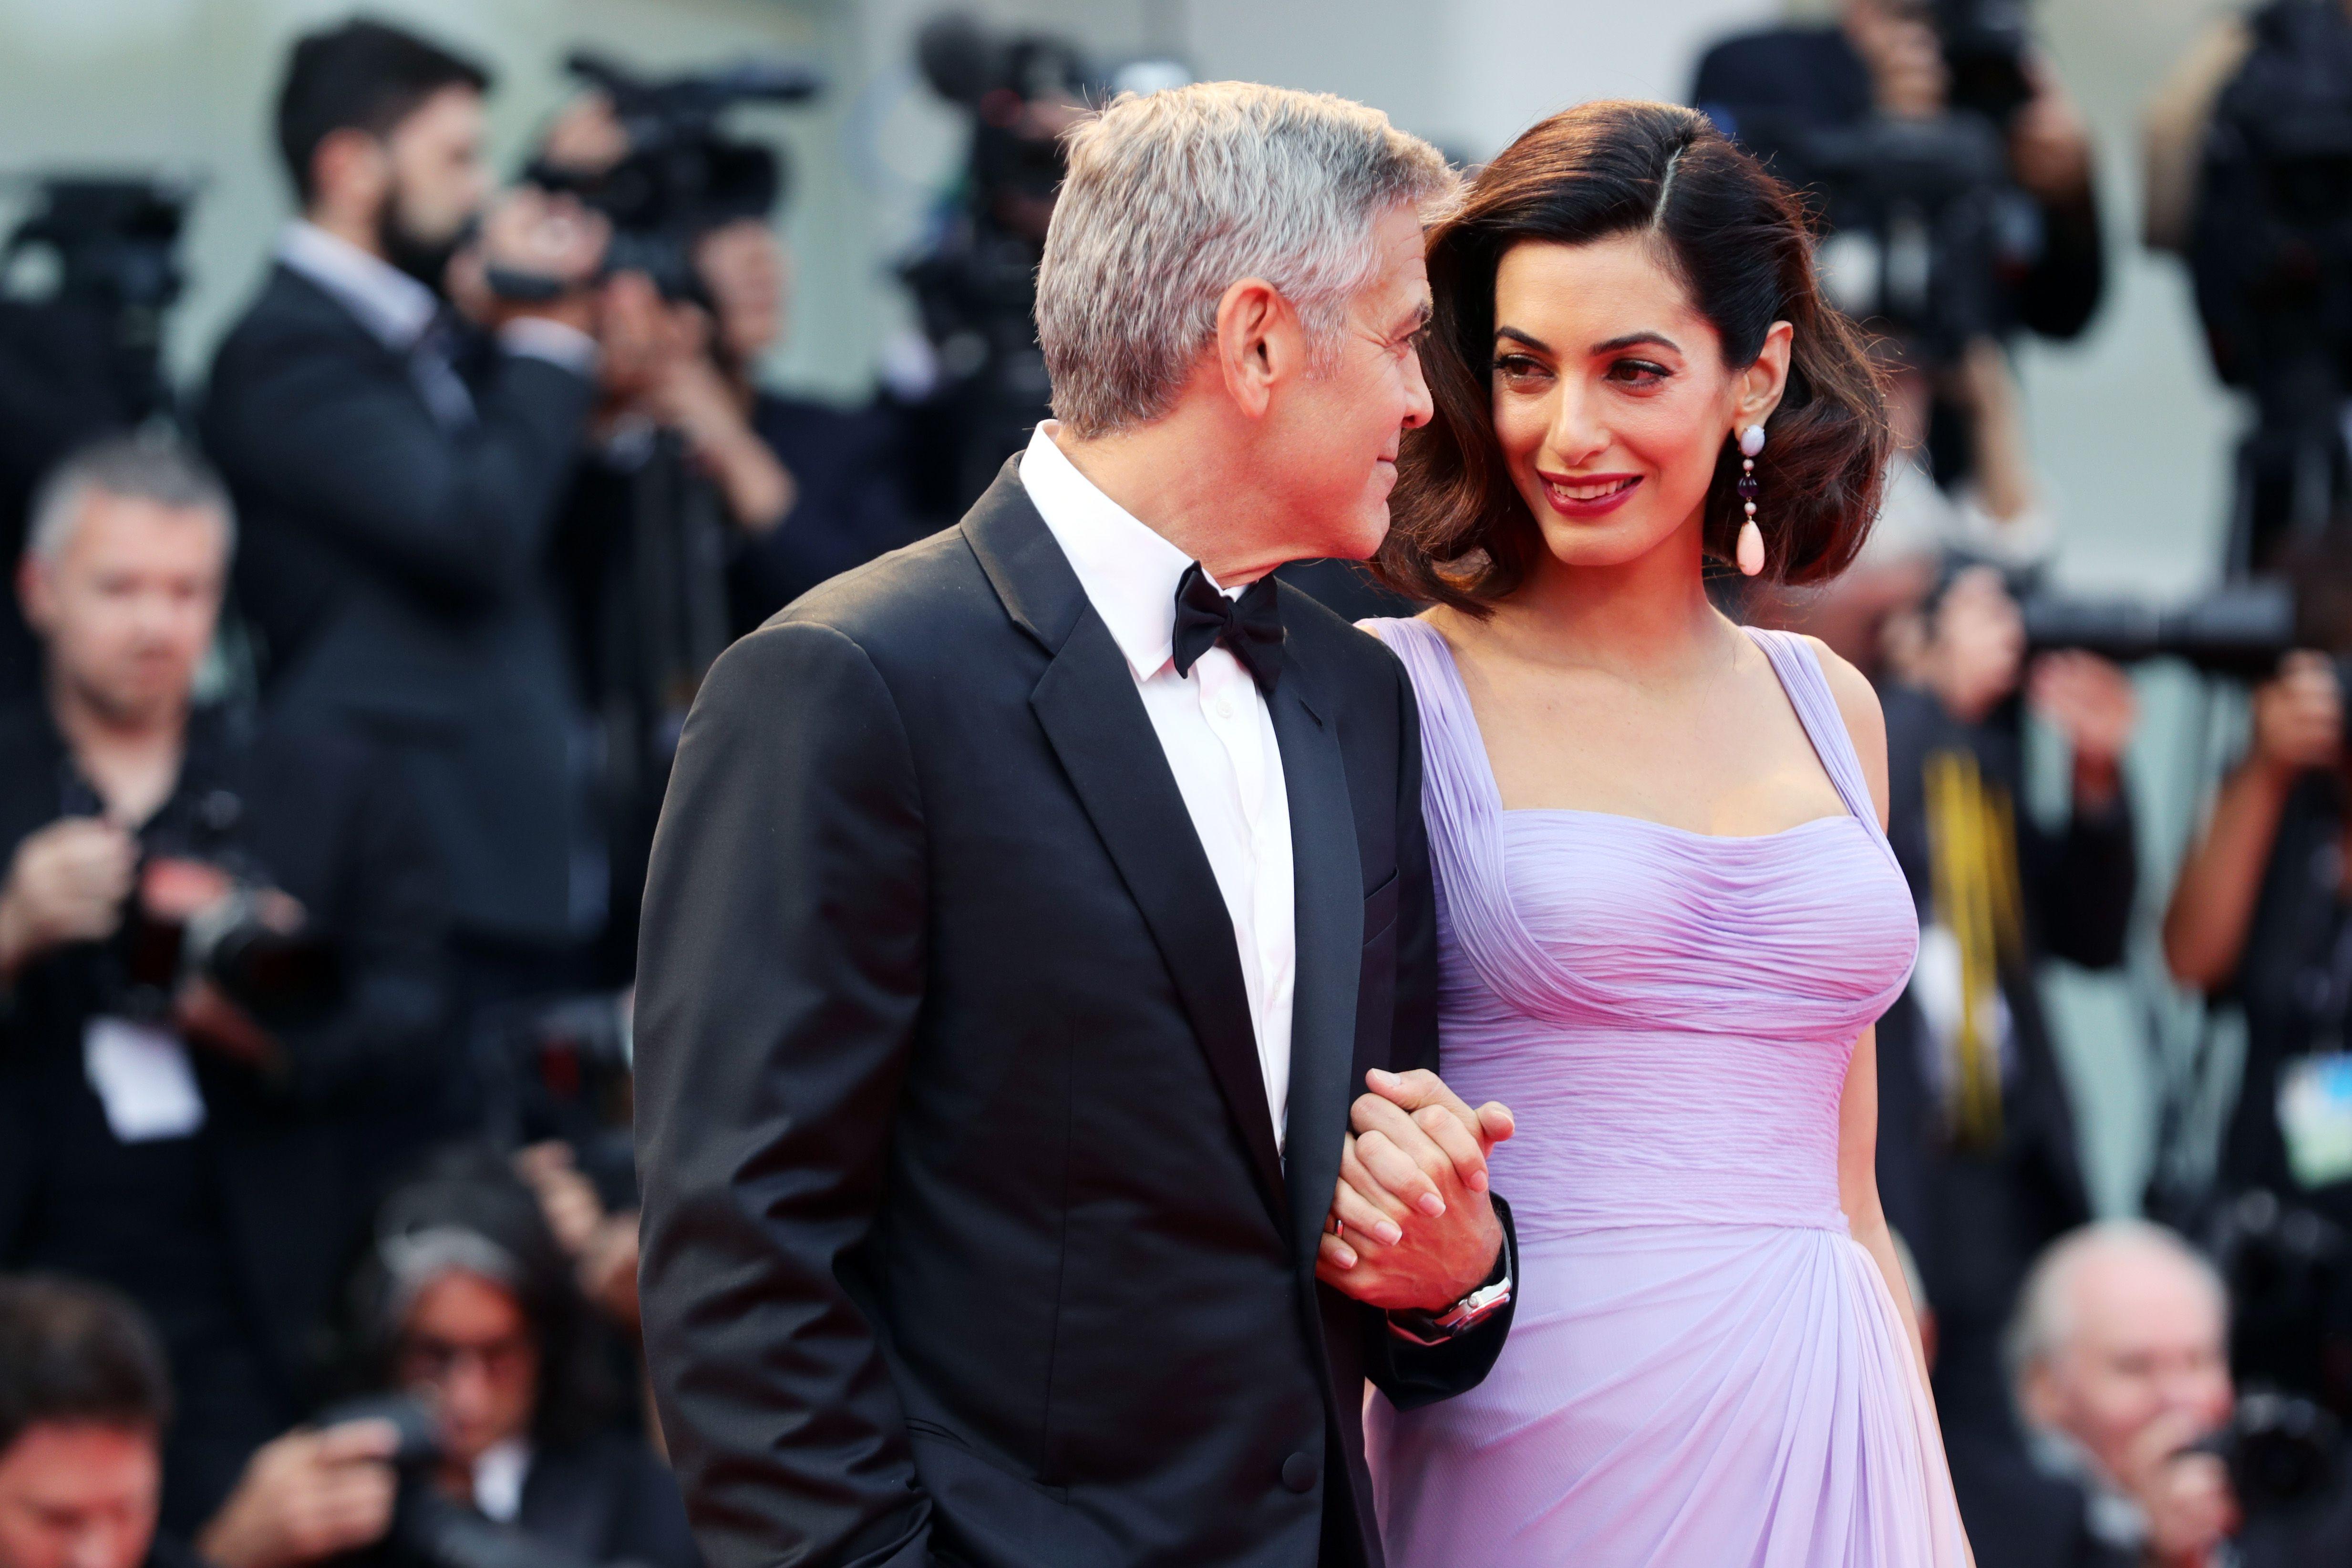 Watch Once a Month, Women Seek George Clooney Instead of Tom Hanks video